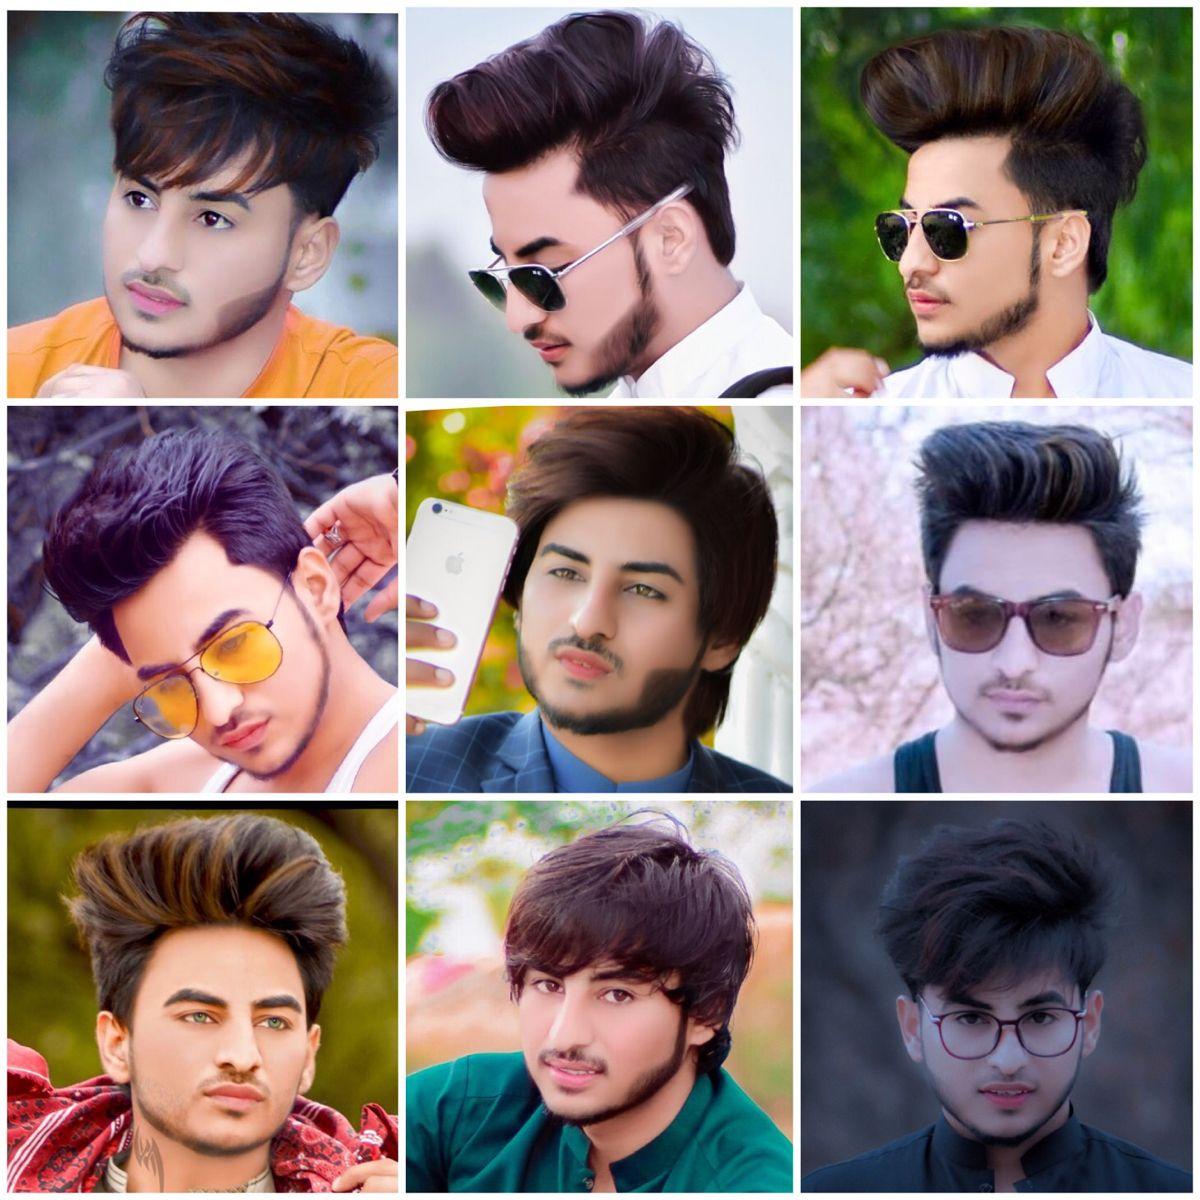 Most Popular Boy Hairstyle 2020 Boy Hairstyles Popular Boy Hairstyles New Hair